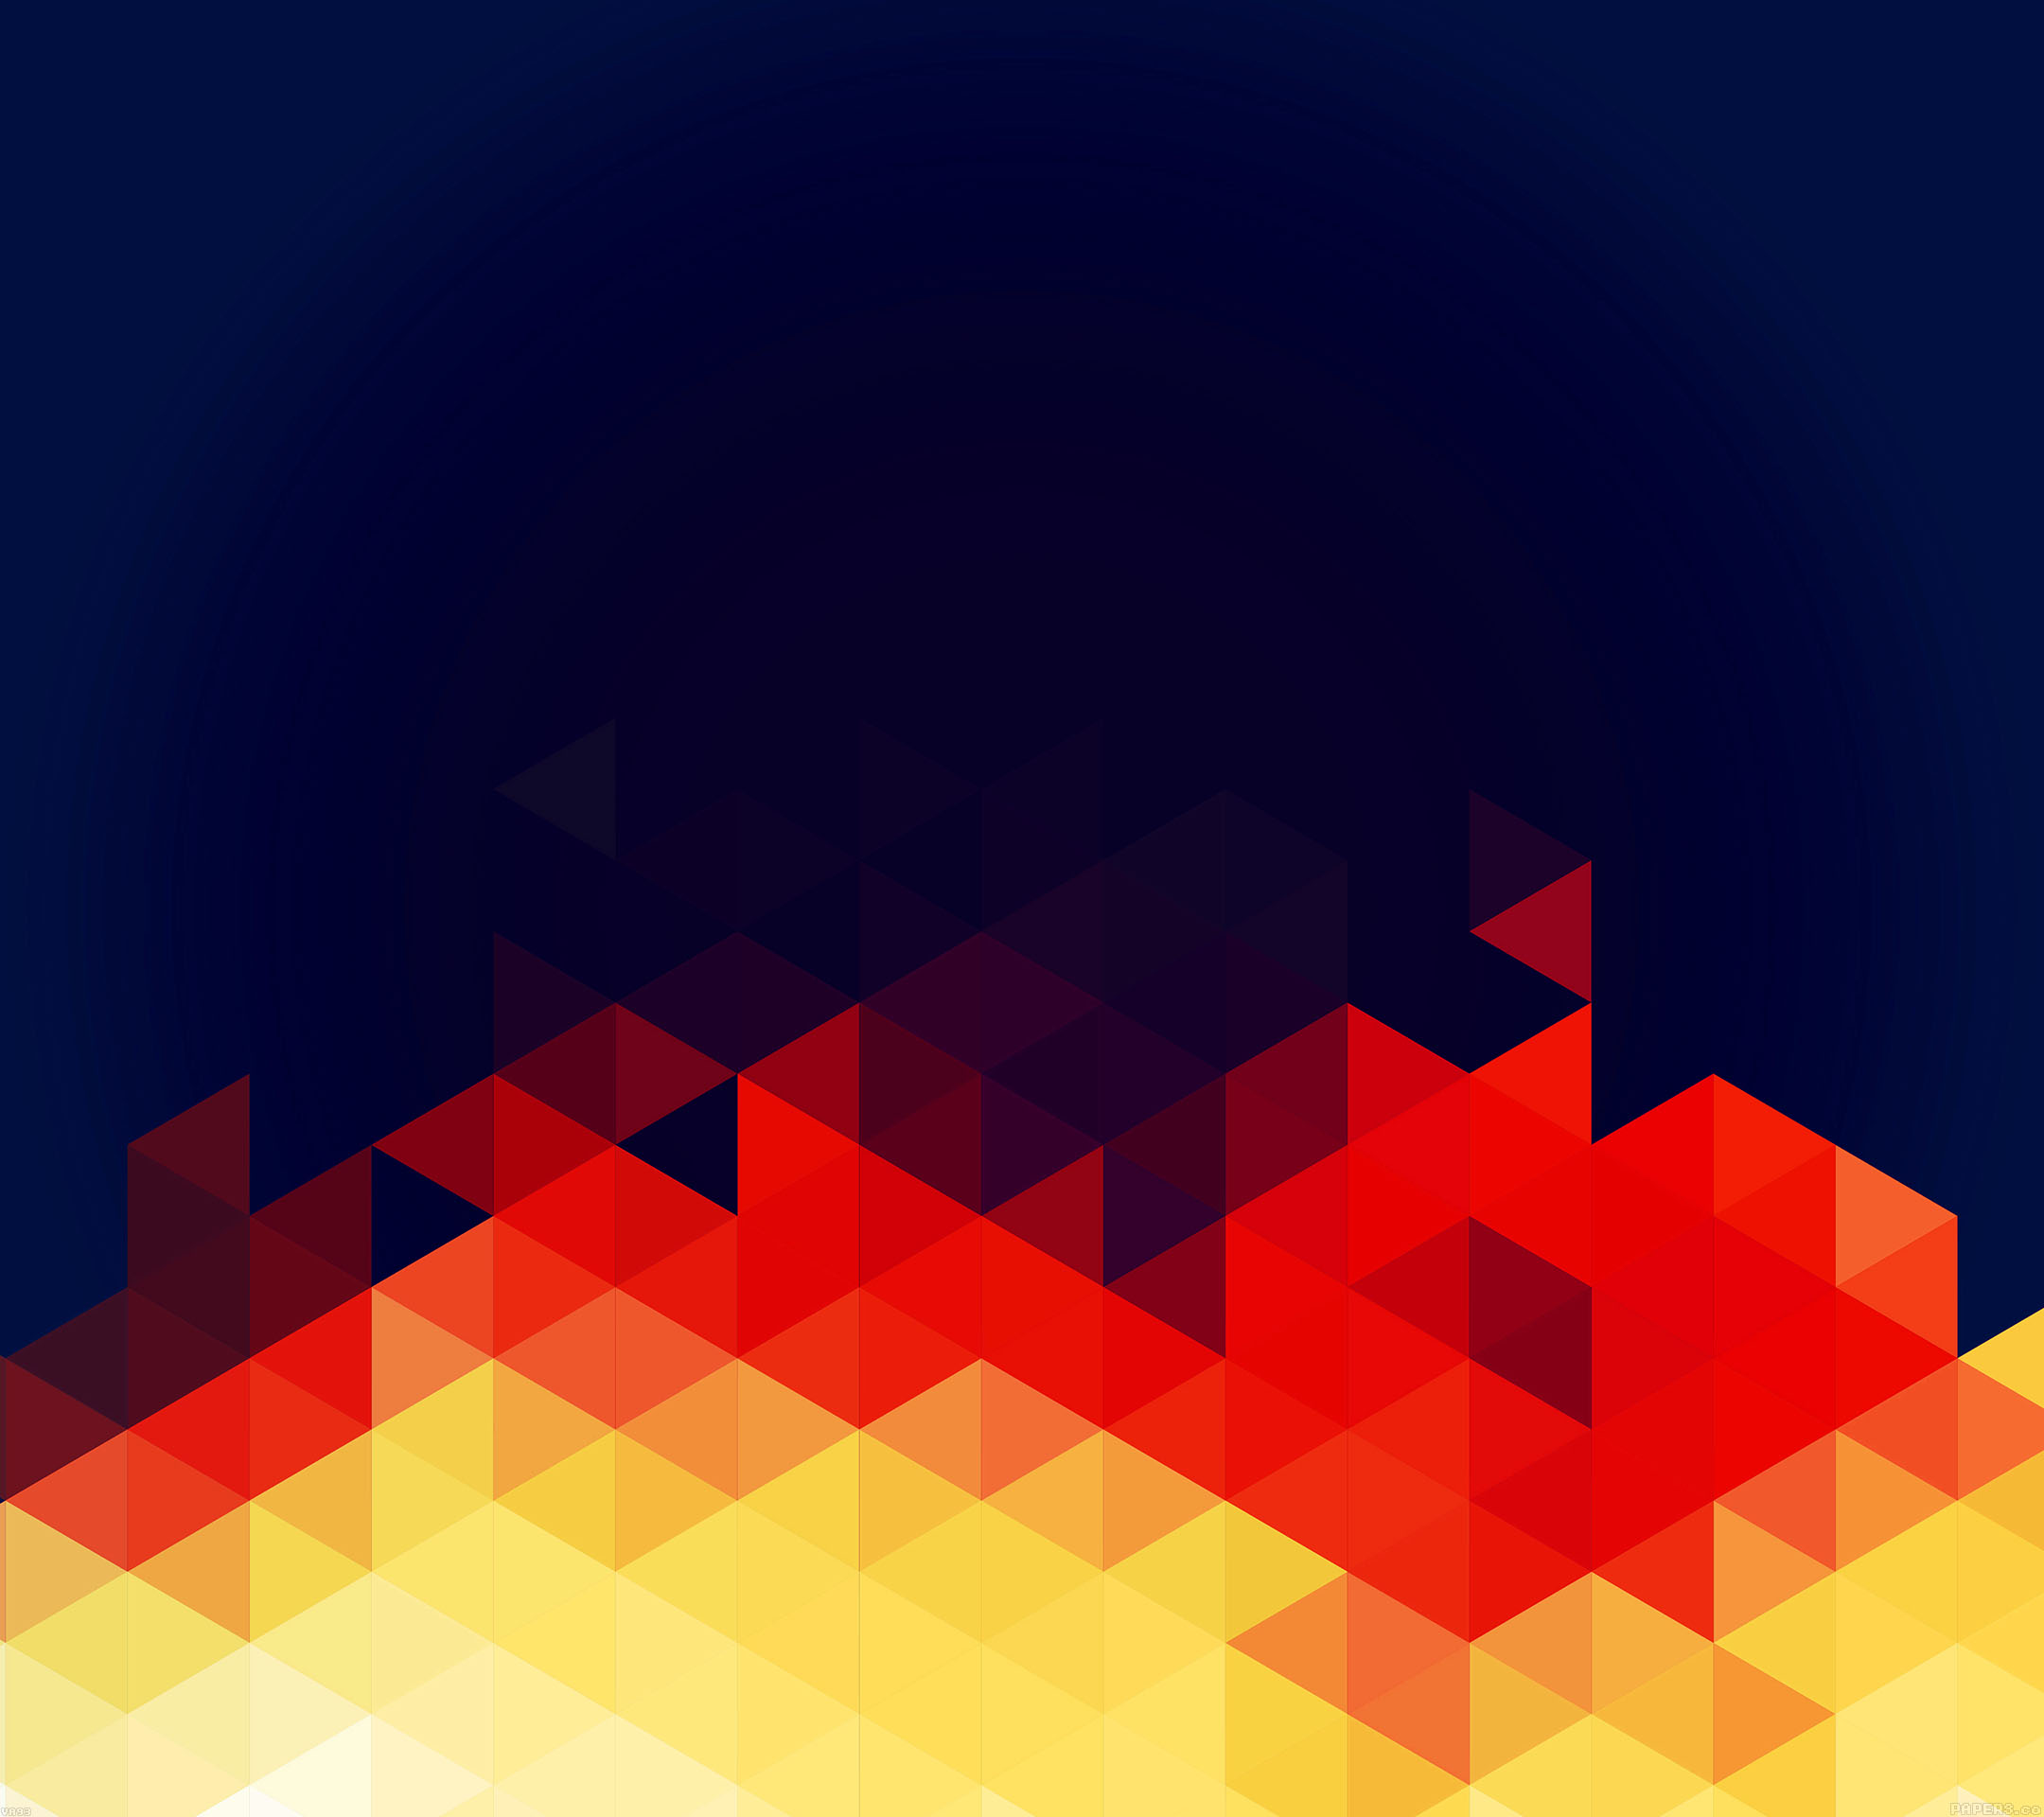 co-va93-wallpaper-triangle-fall-reverse-pattern-15-wallpaper jpgTriangle Pattern Wallpaper